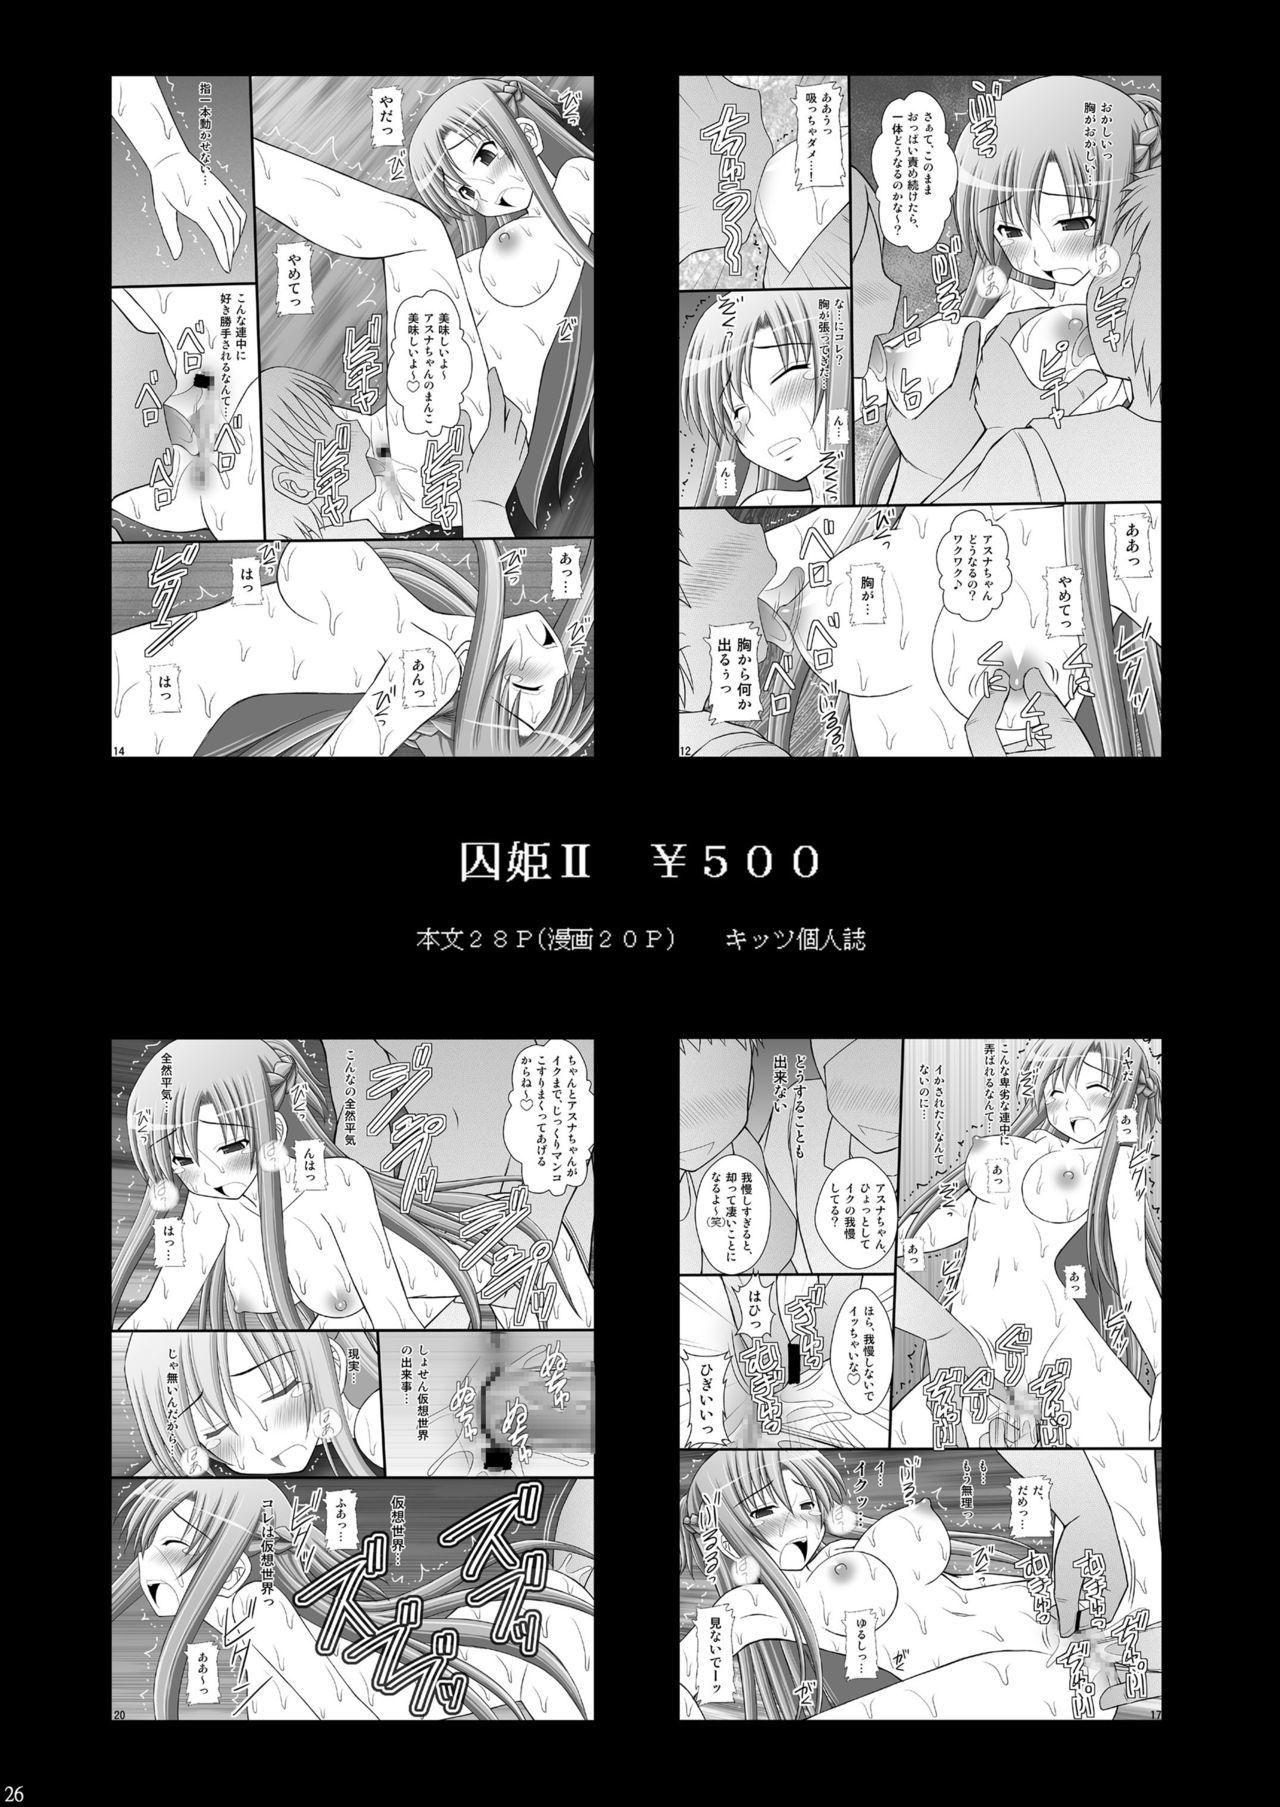 [Asanoya (Kittsu)] Toraware Hime III - Asuna Nakadashi 100-nin Dekiru ka na   Hostage Princess III (Sword Art Online) [English] [HypnoMangaEditor] [Digital] 24